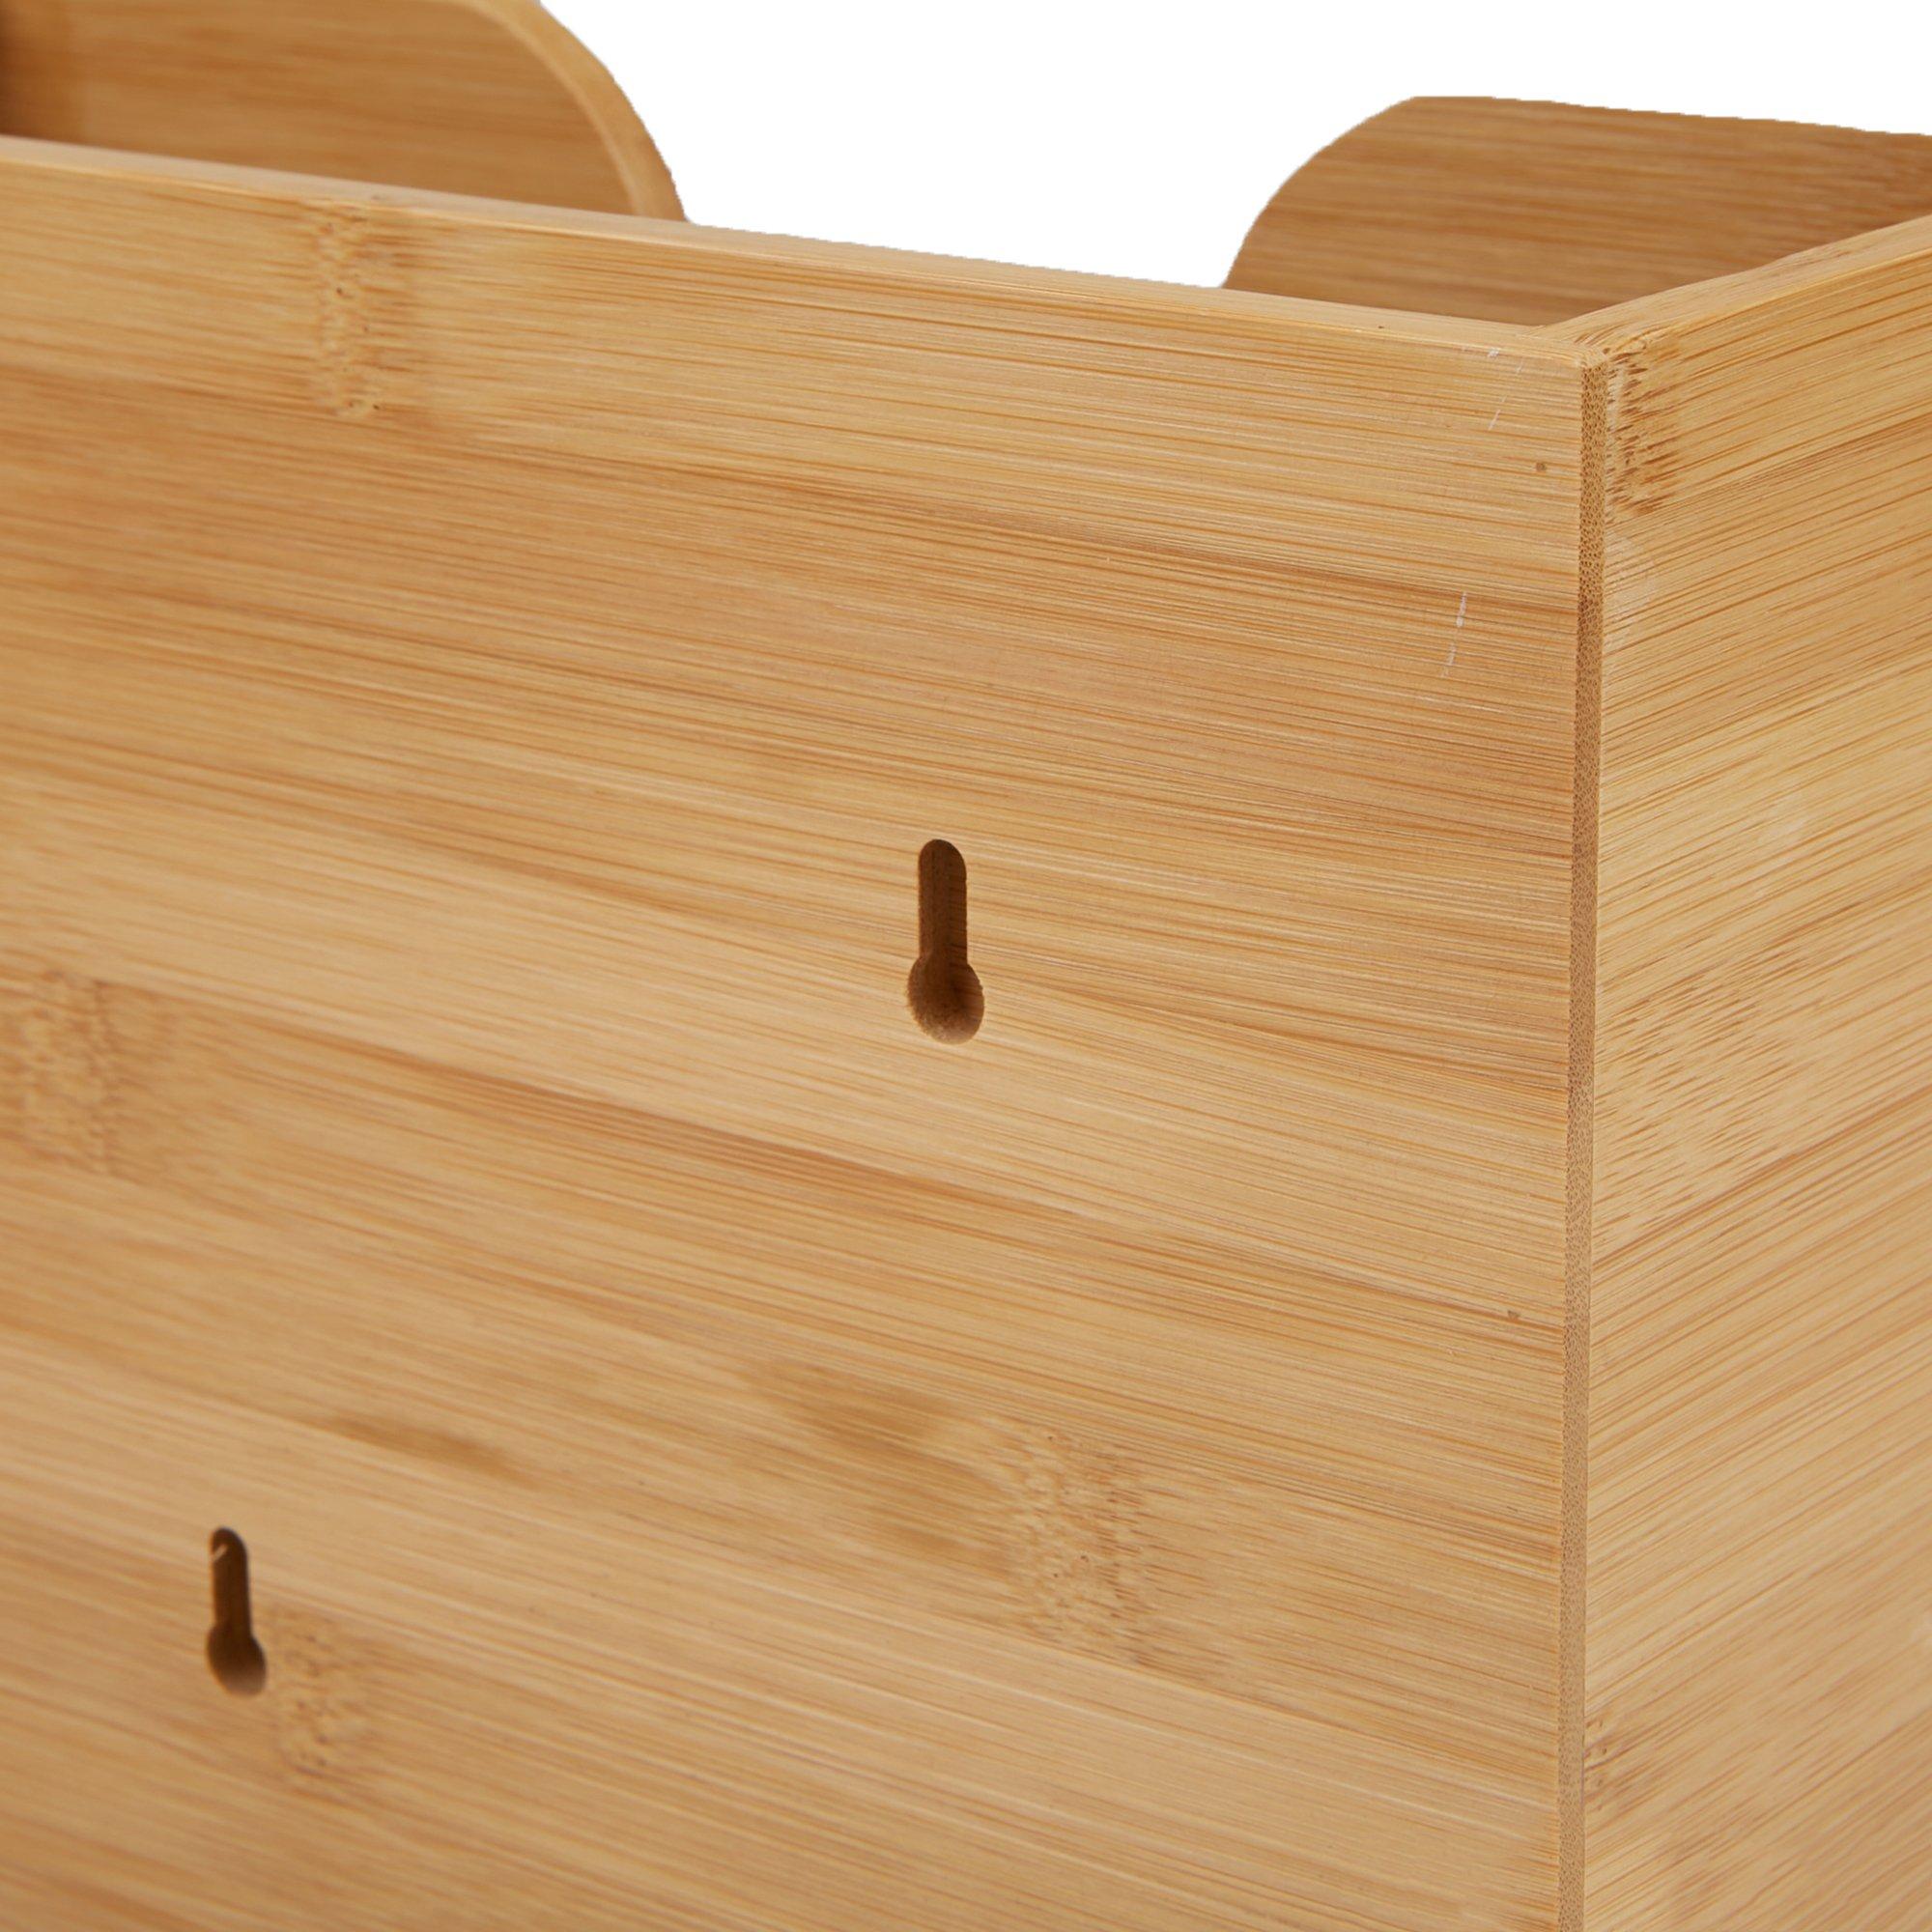 Mind Reader Bamboo Wall Mount Interfold Napkin Dispenser Organizer, Brown by Mind Reader (Image #6)